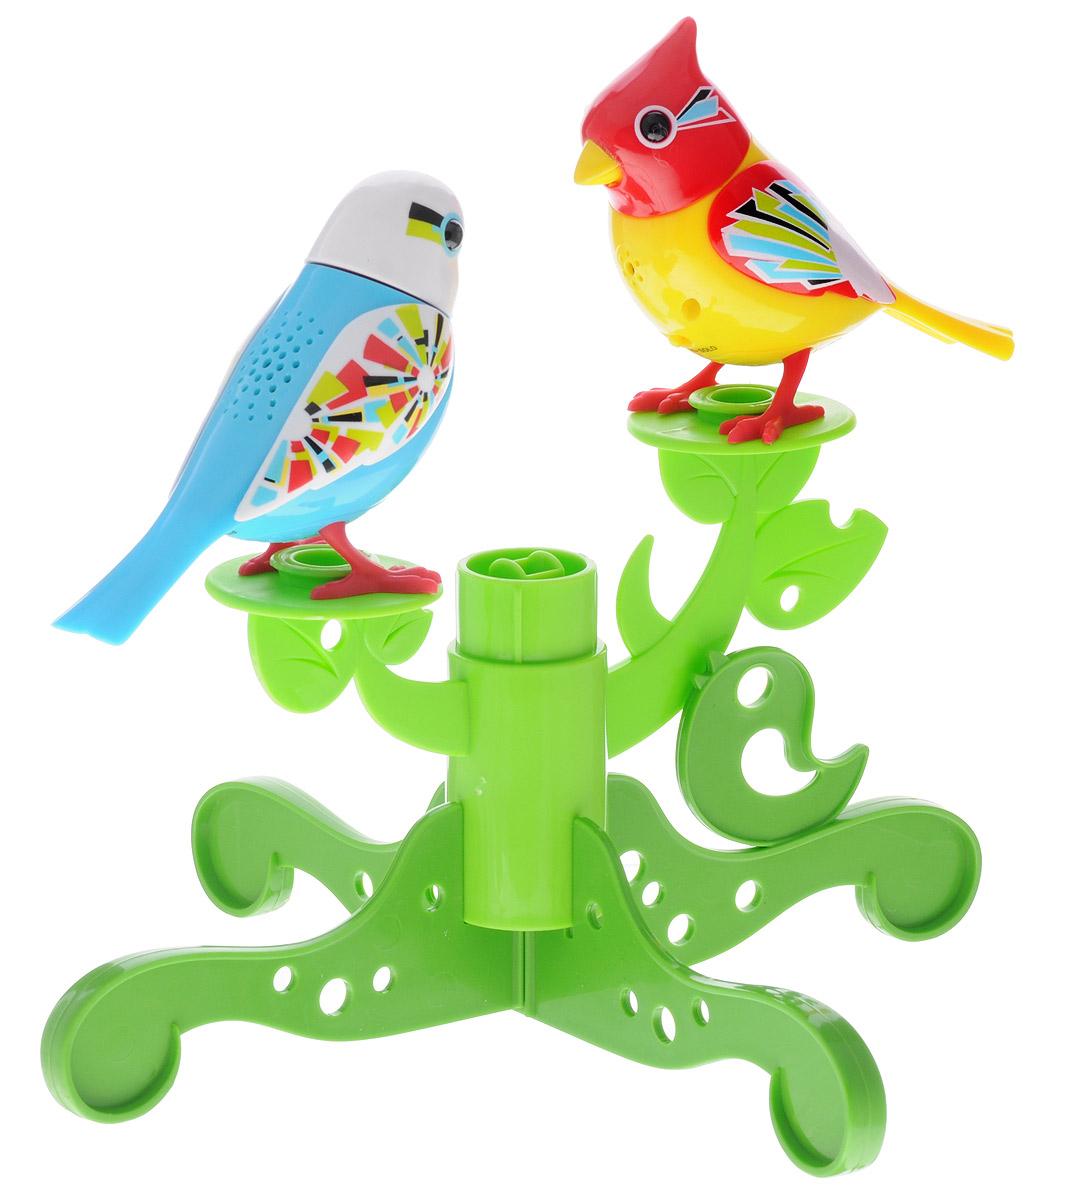 DigiFriends Интерактивная игрушка Две птички с деревом цвет голубой желтый silverlit две птички с деревом зелено голубые digibirds